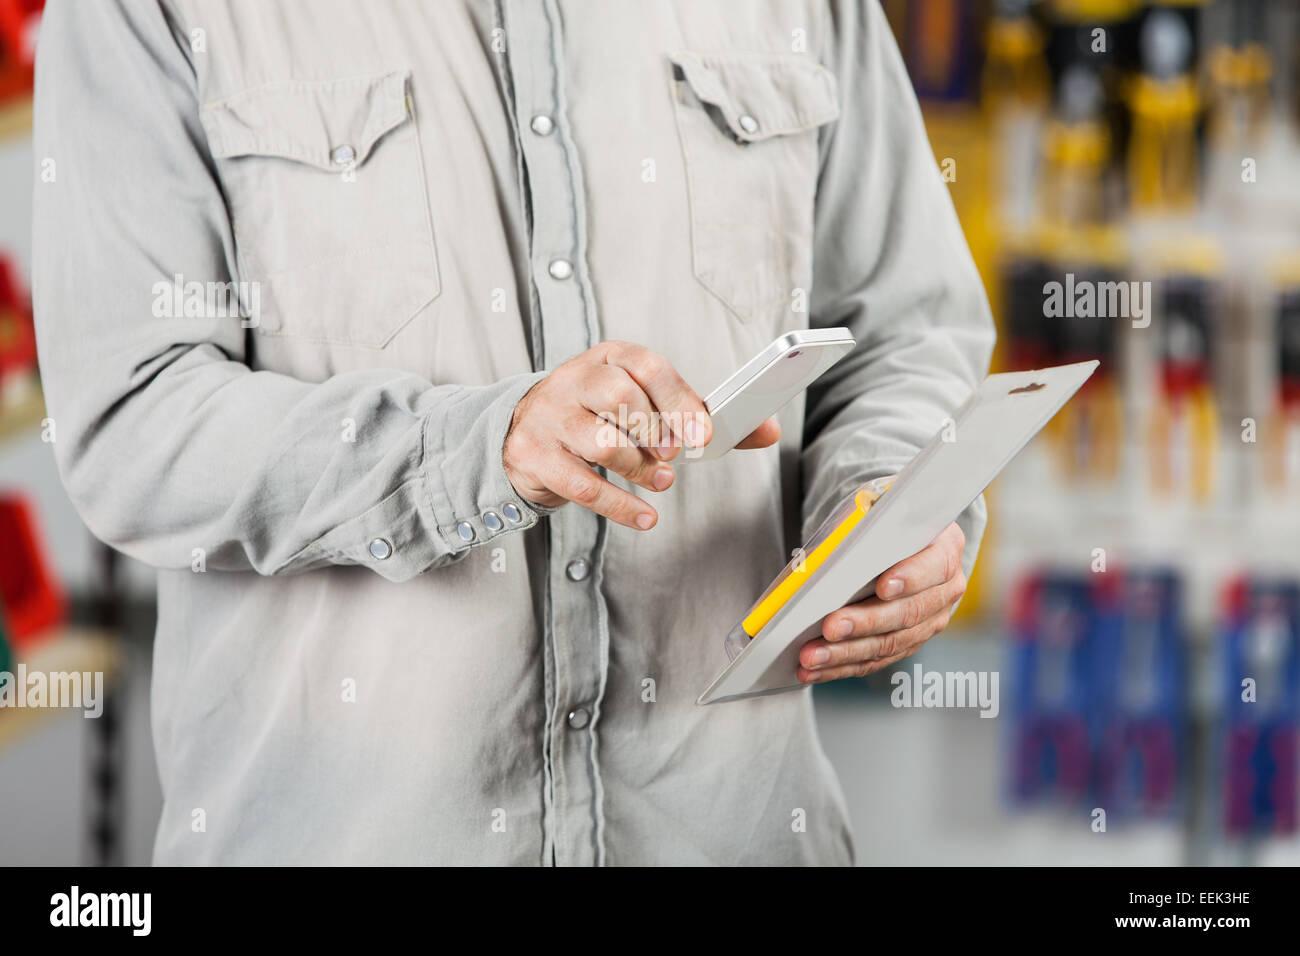 Customer Scanning Tool Packet Through Mobilephone - Stock Image